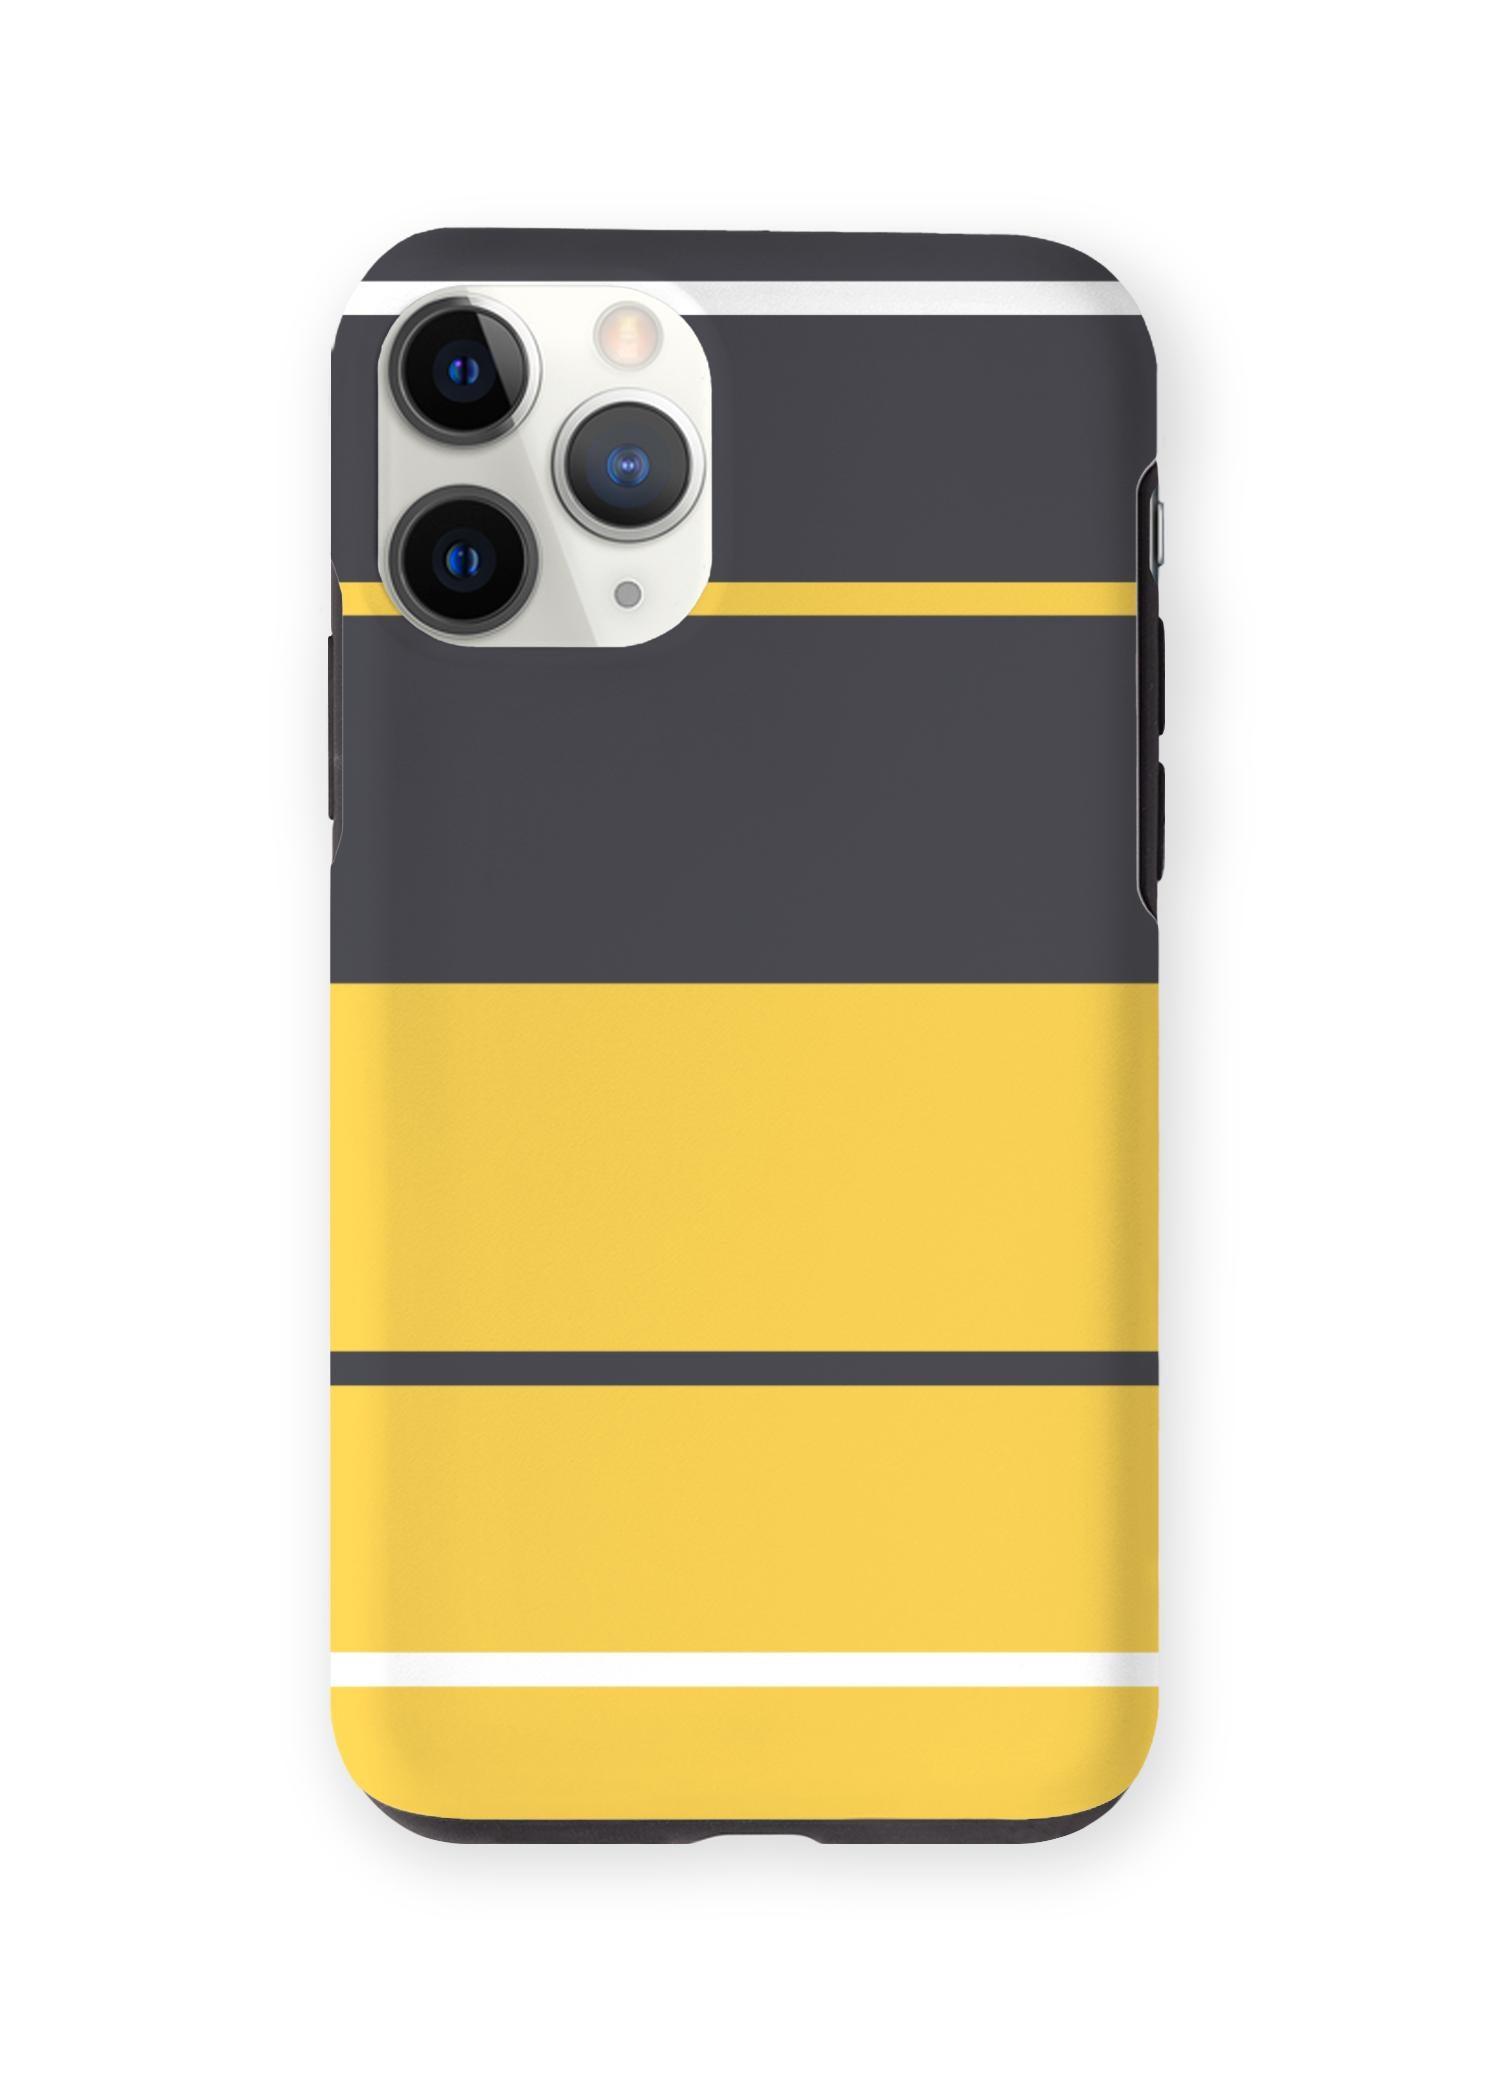 VIDA iPhone Case - Blue Yellow Fashion by VIDA Original Artist  - Size: iPhone 11 Pro / Tough